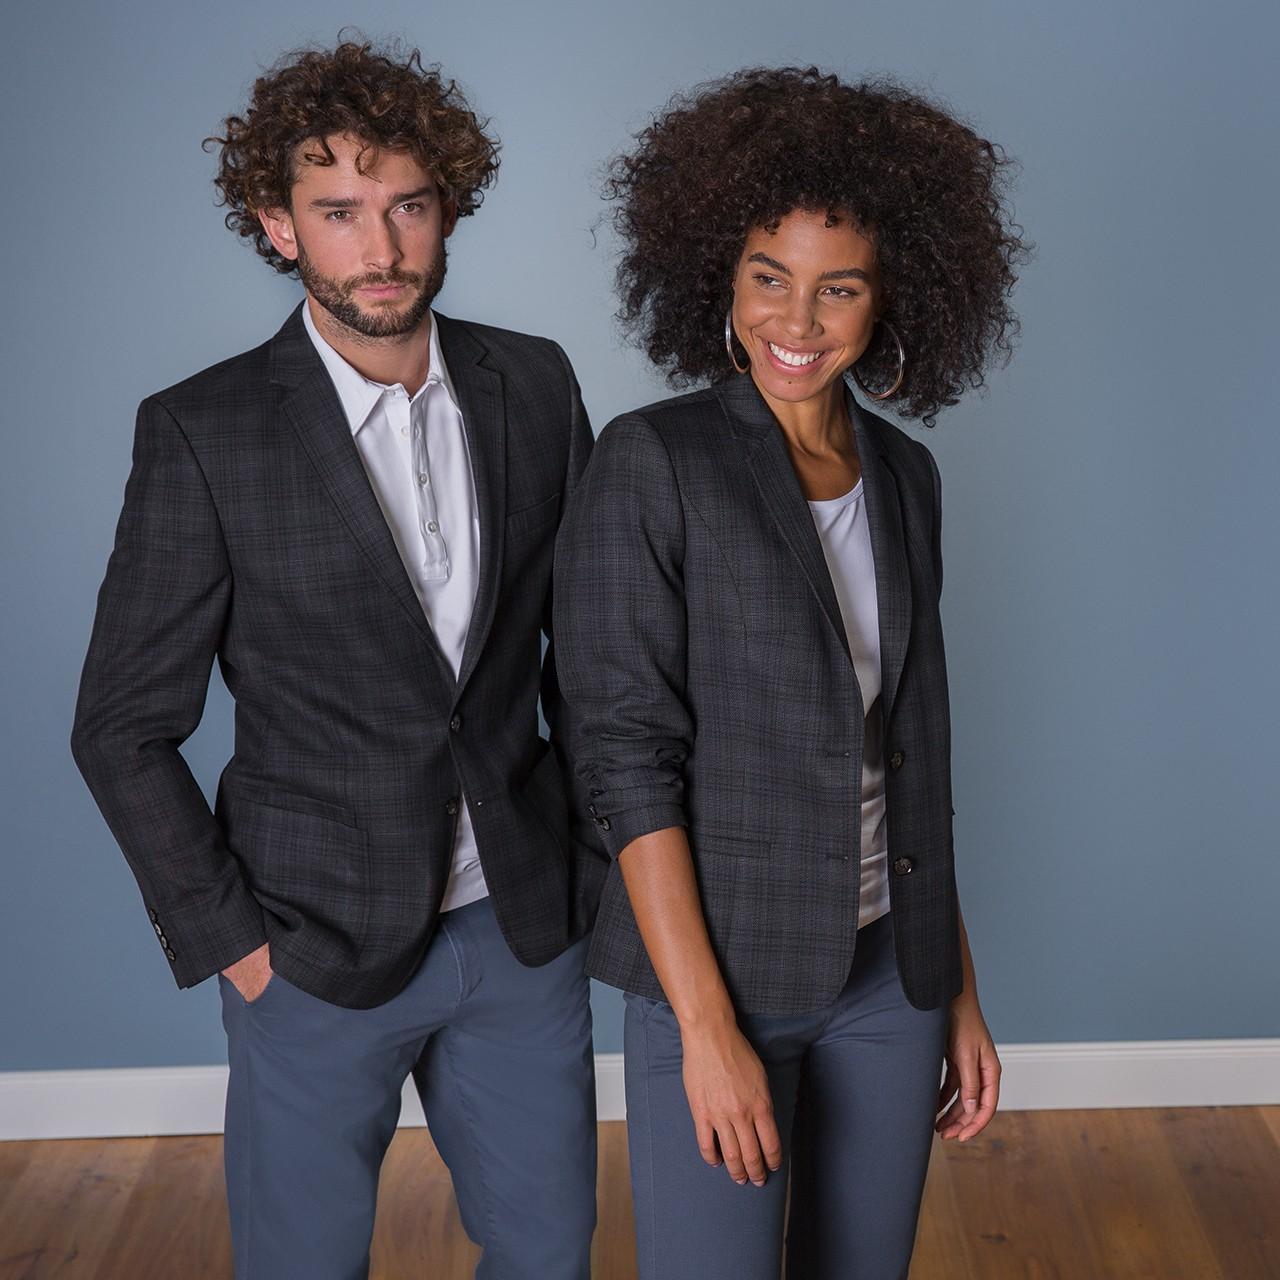 Damen-Blazer RF Casual Kariert Greiff® | bedrucken, besticken, bedrucken lassen, besticken lassen, mit Logo |